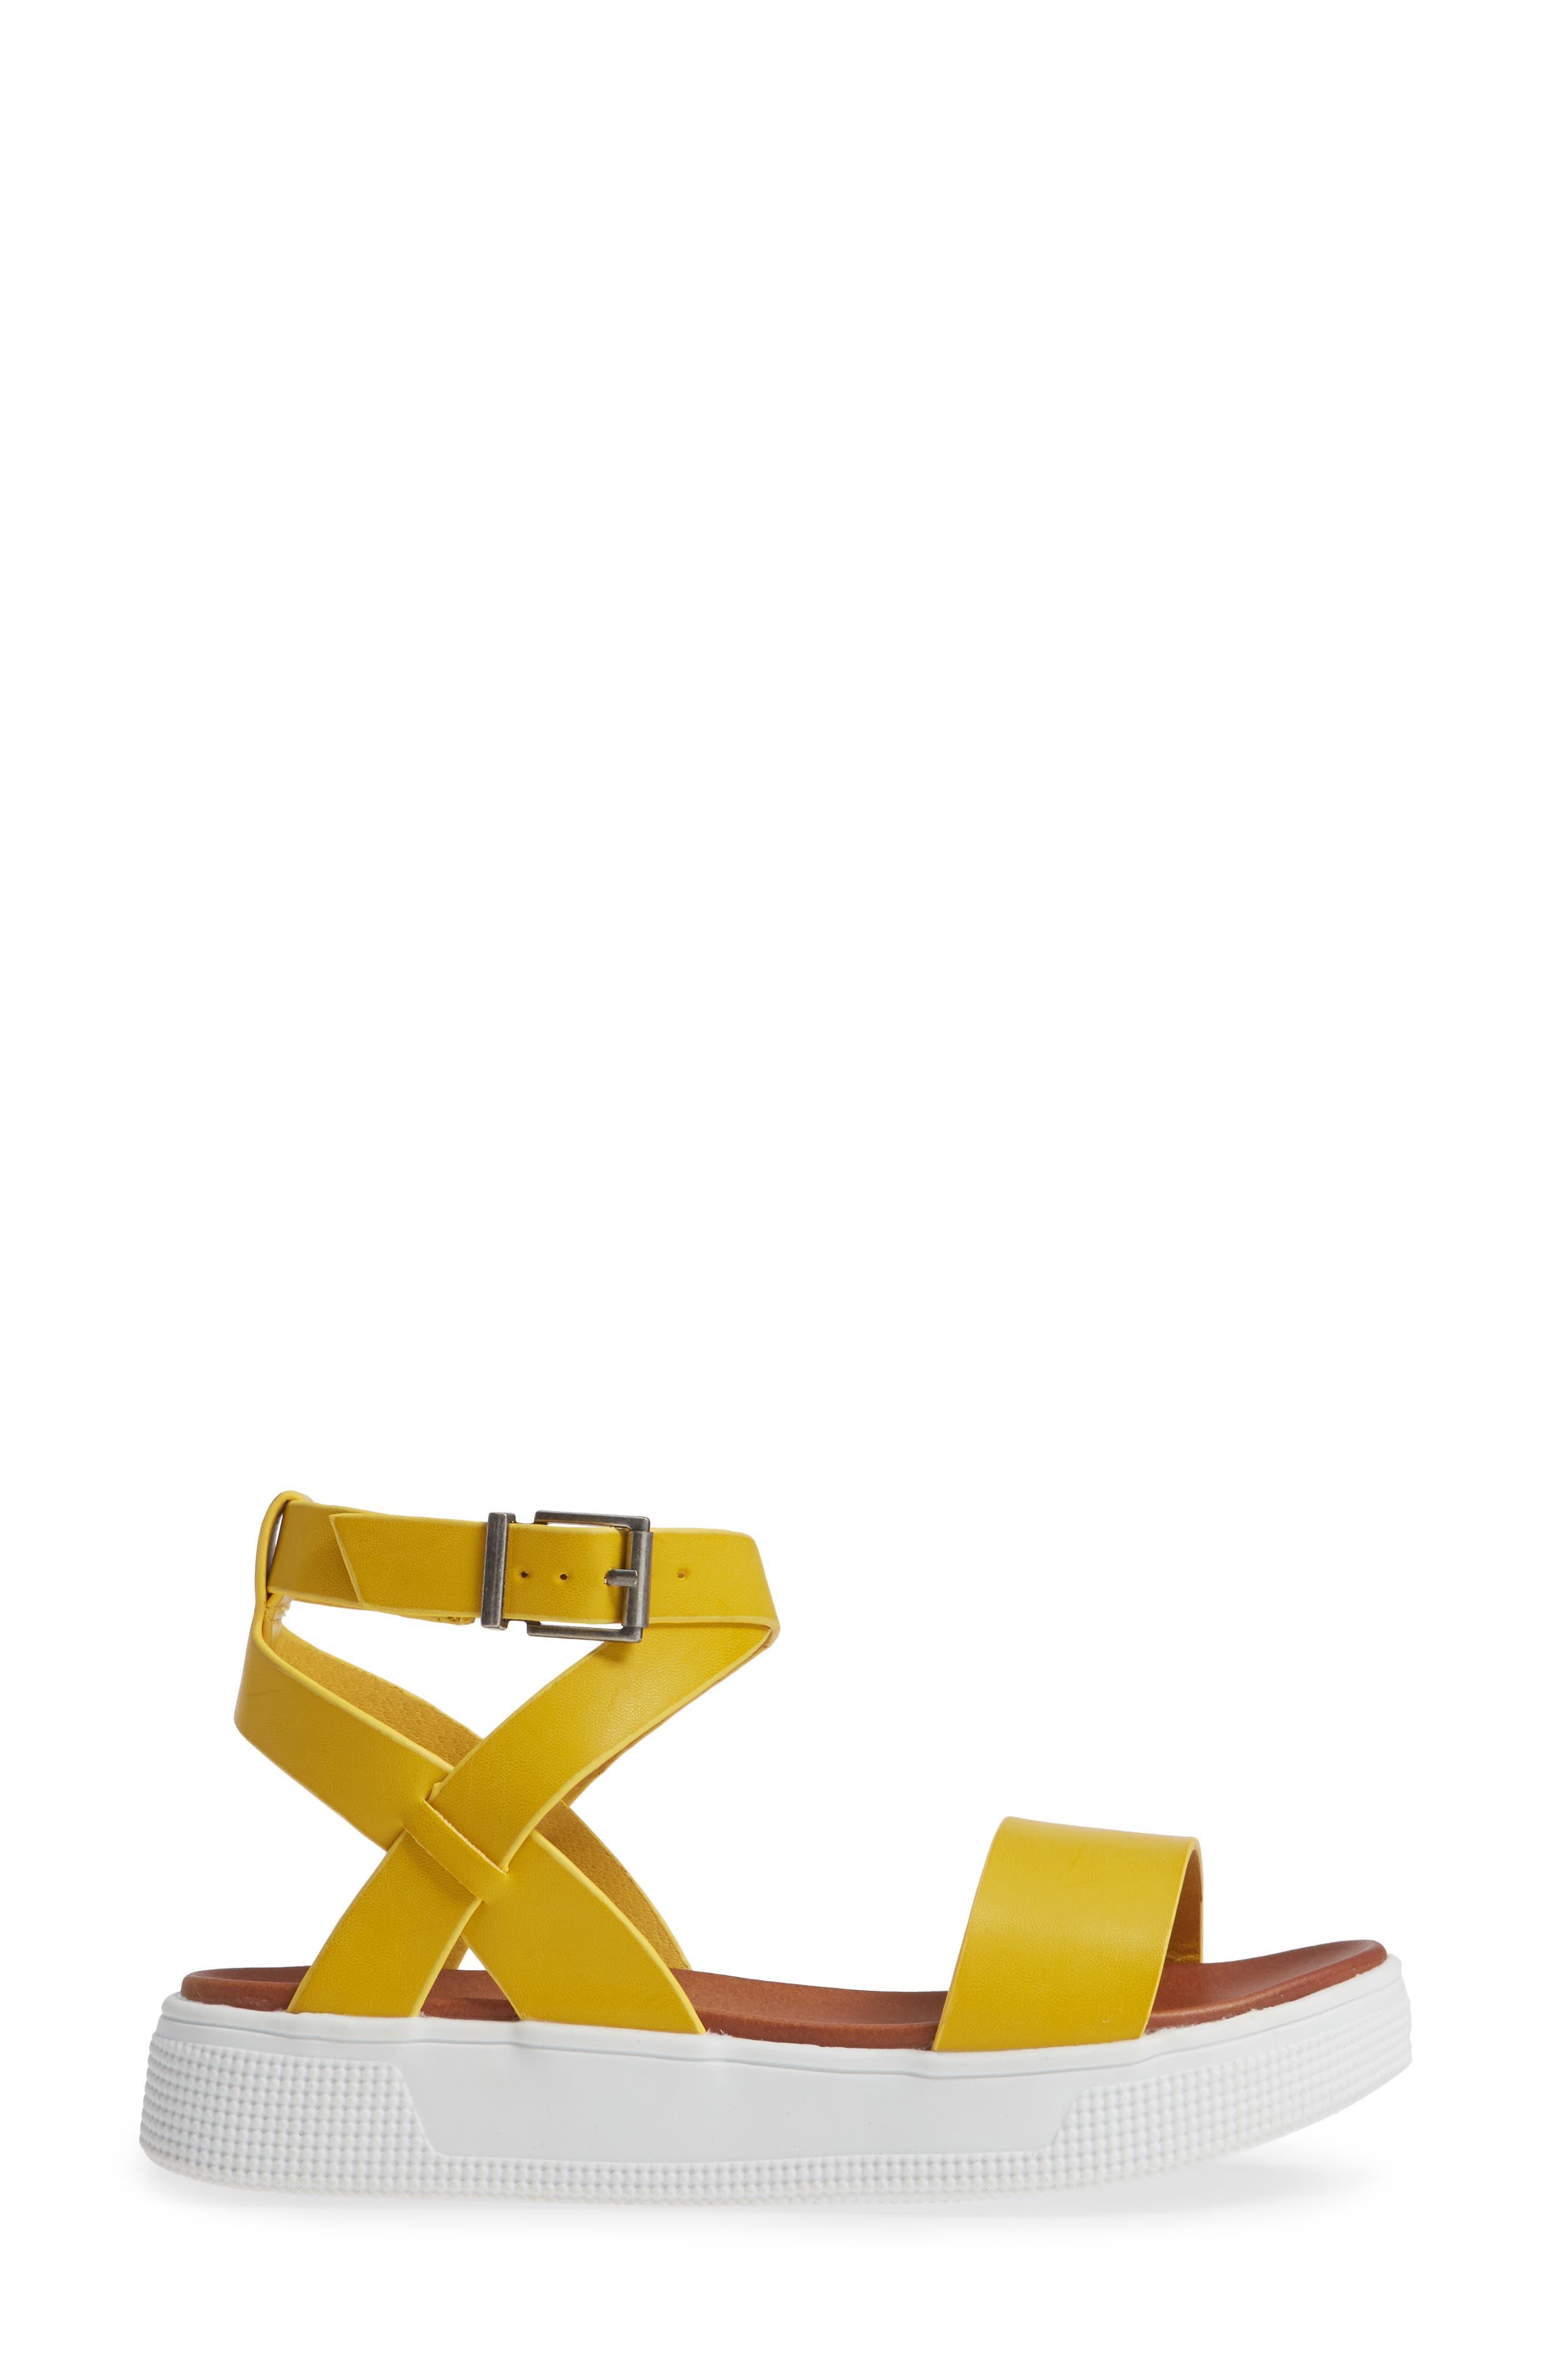 Calla Platform Sandal,                             Alternate thumbnail 3, color,                             YELLOW FAUX LEATHER